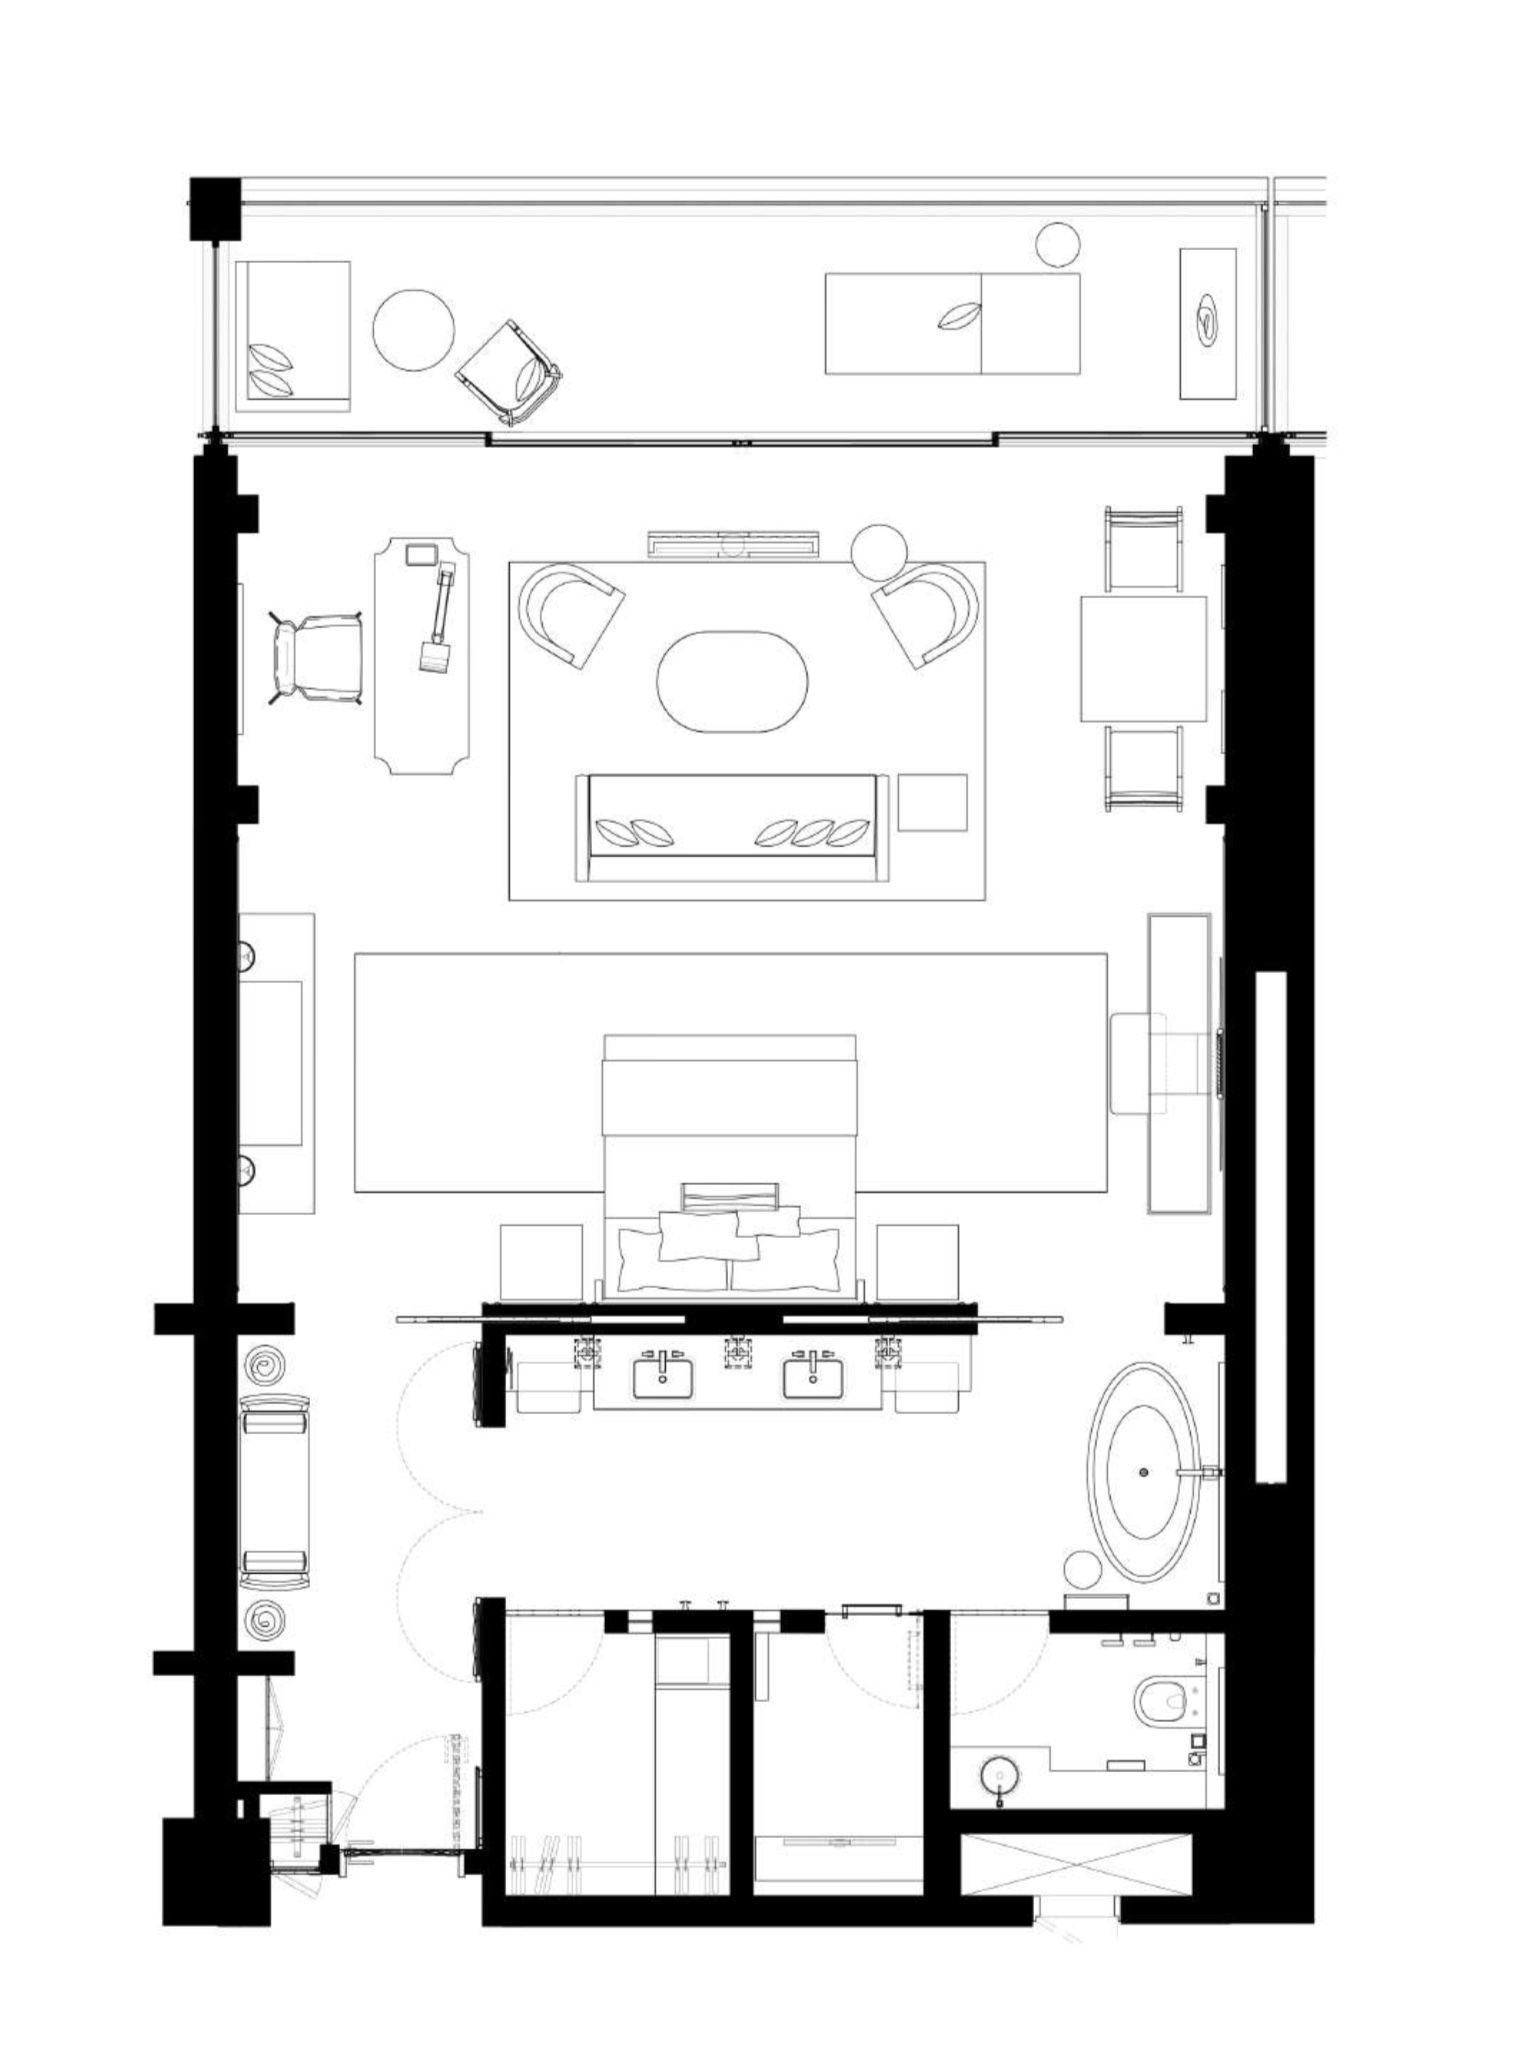 Mandarin Oriental Jumeira Dubai Junior Sea View Suite 89 Sqm 958 Sqf Hotel Room Design Plan Hotel Suite Plan Hotel Room Plan